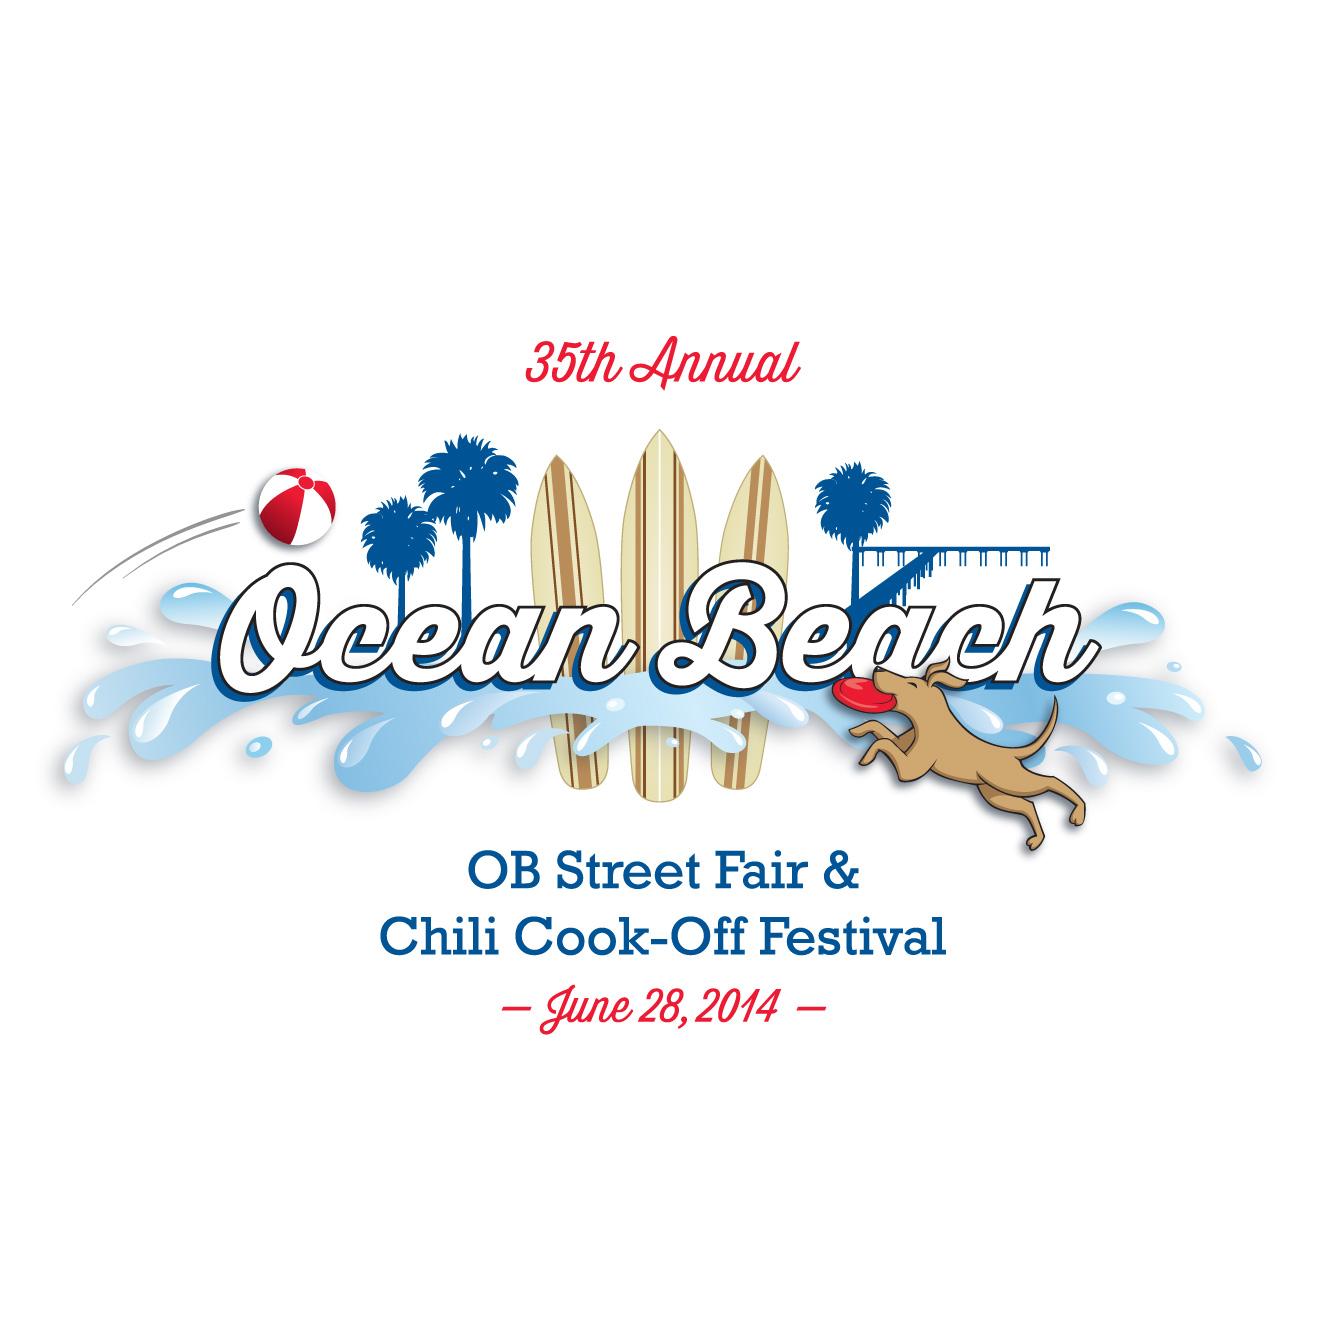 OB Street Fair 2014 logo design by Ashley Lewis